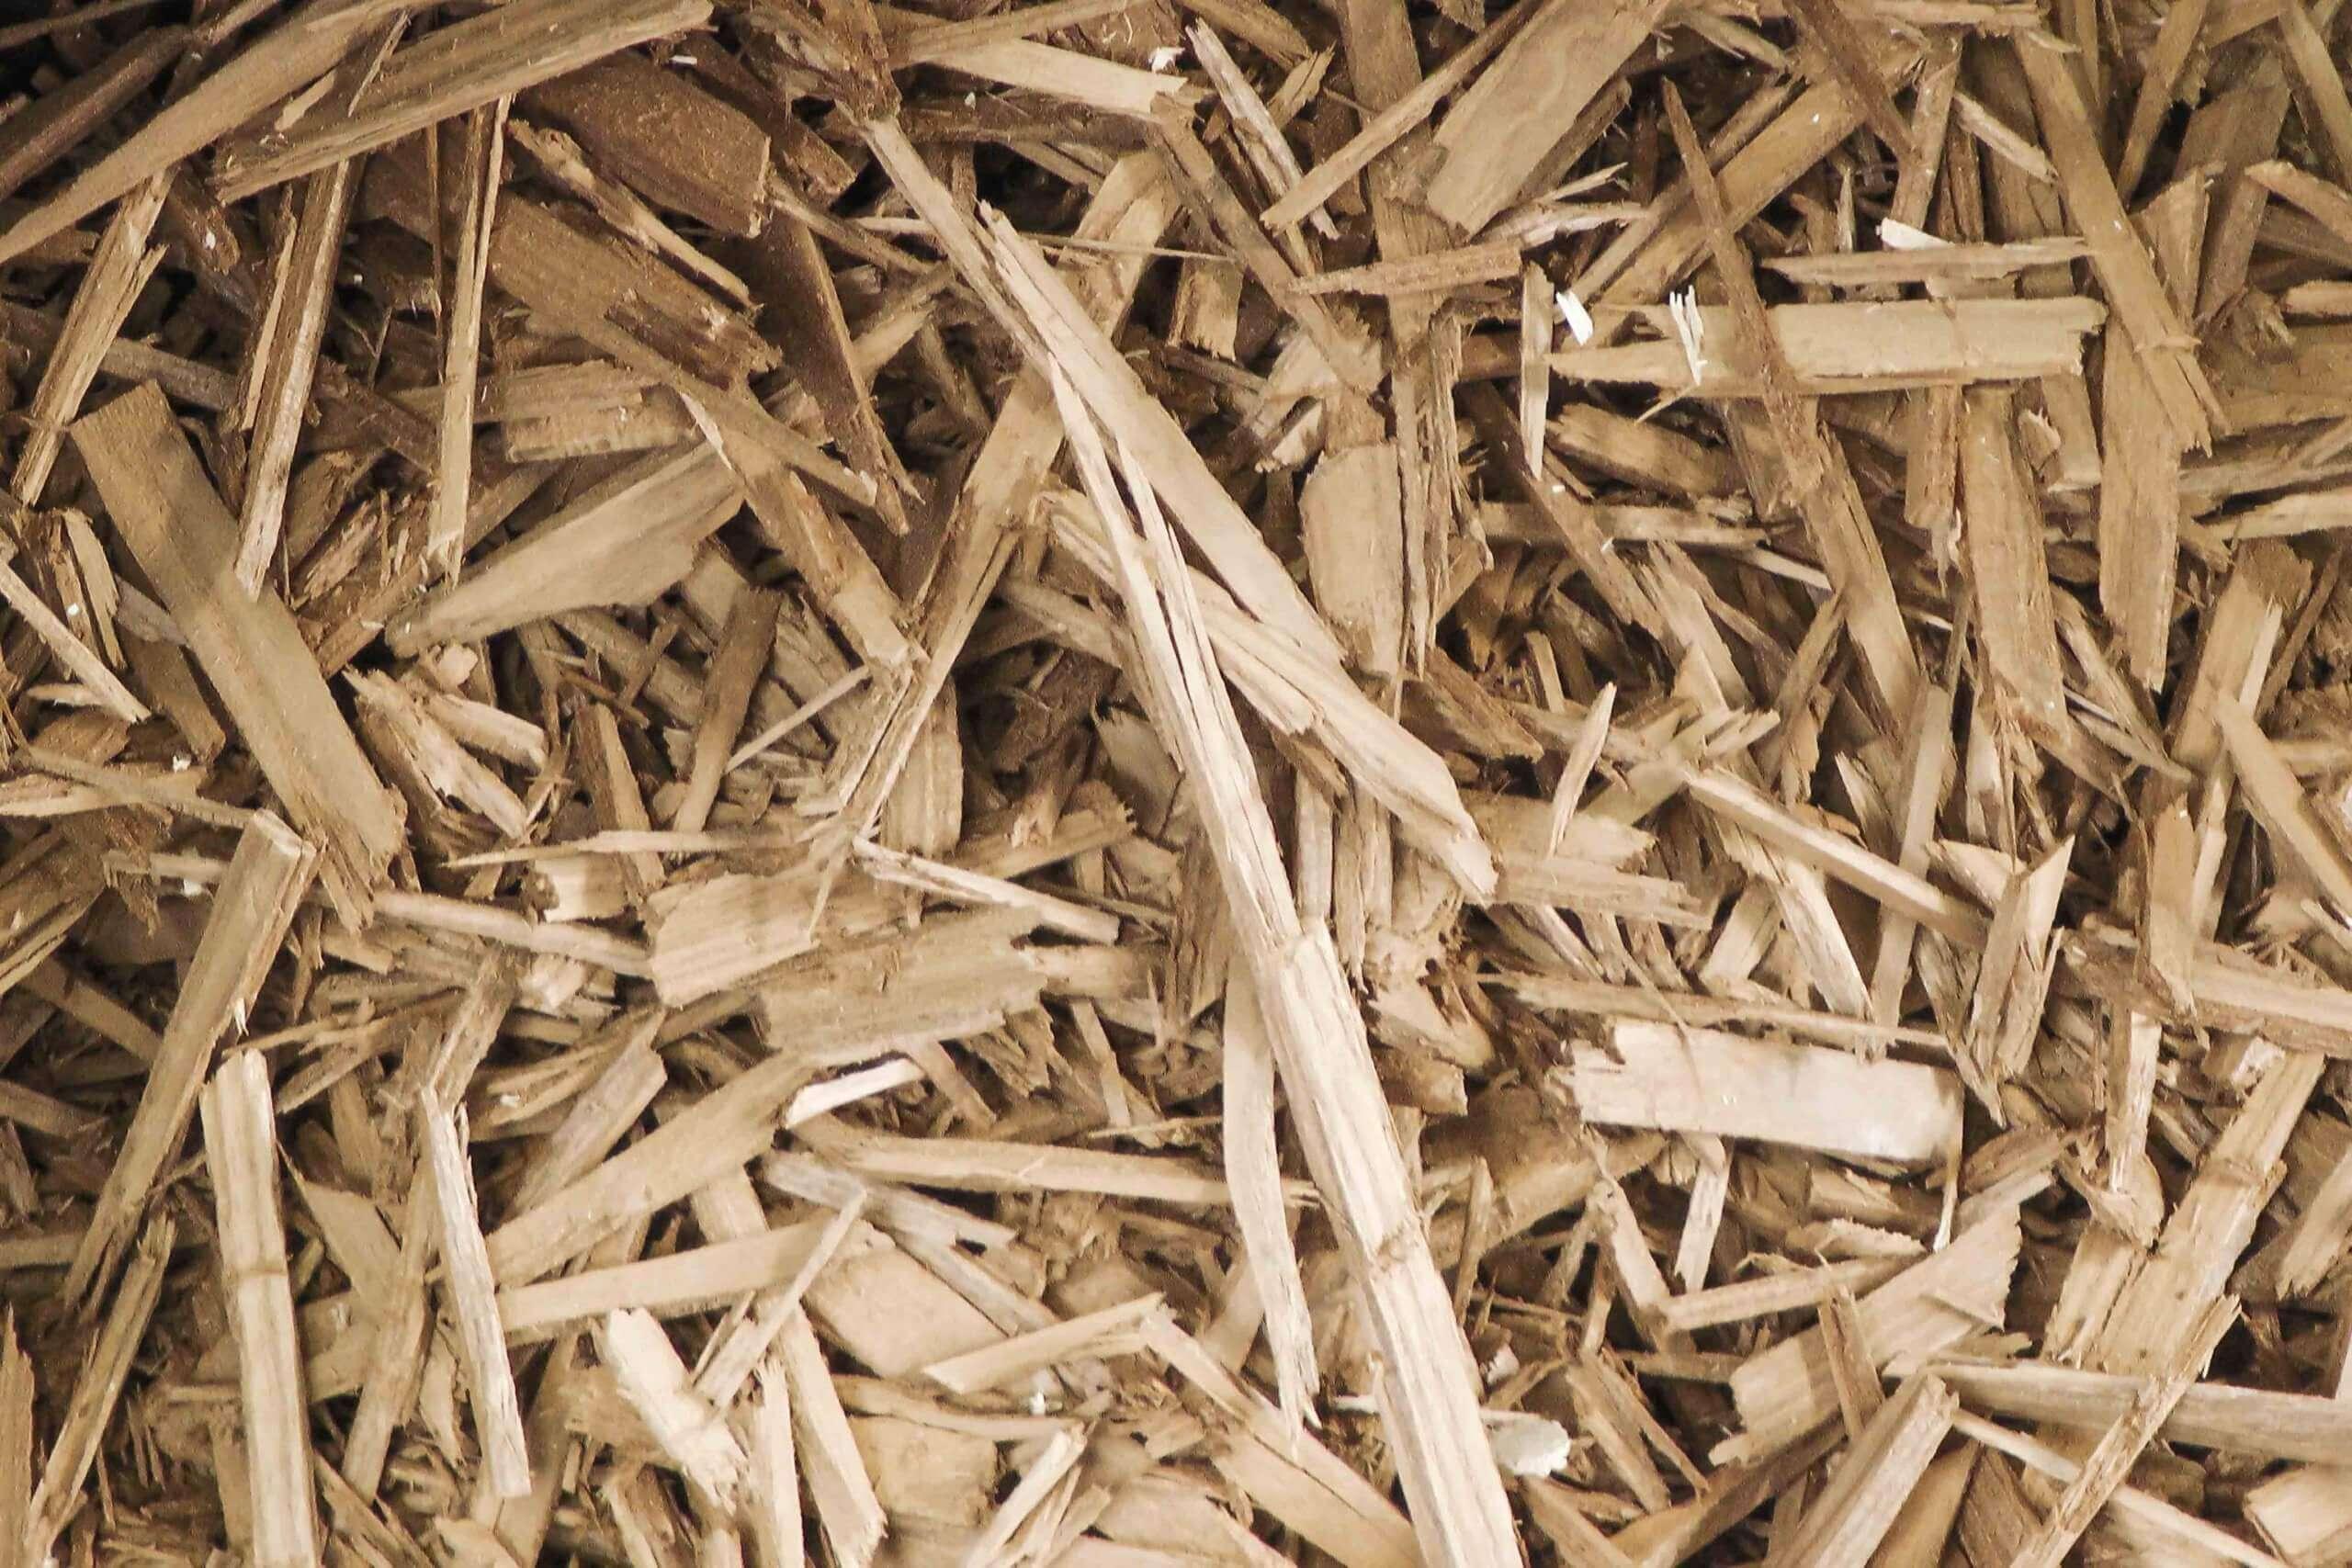 Heap of pre-broken wood